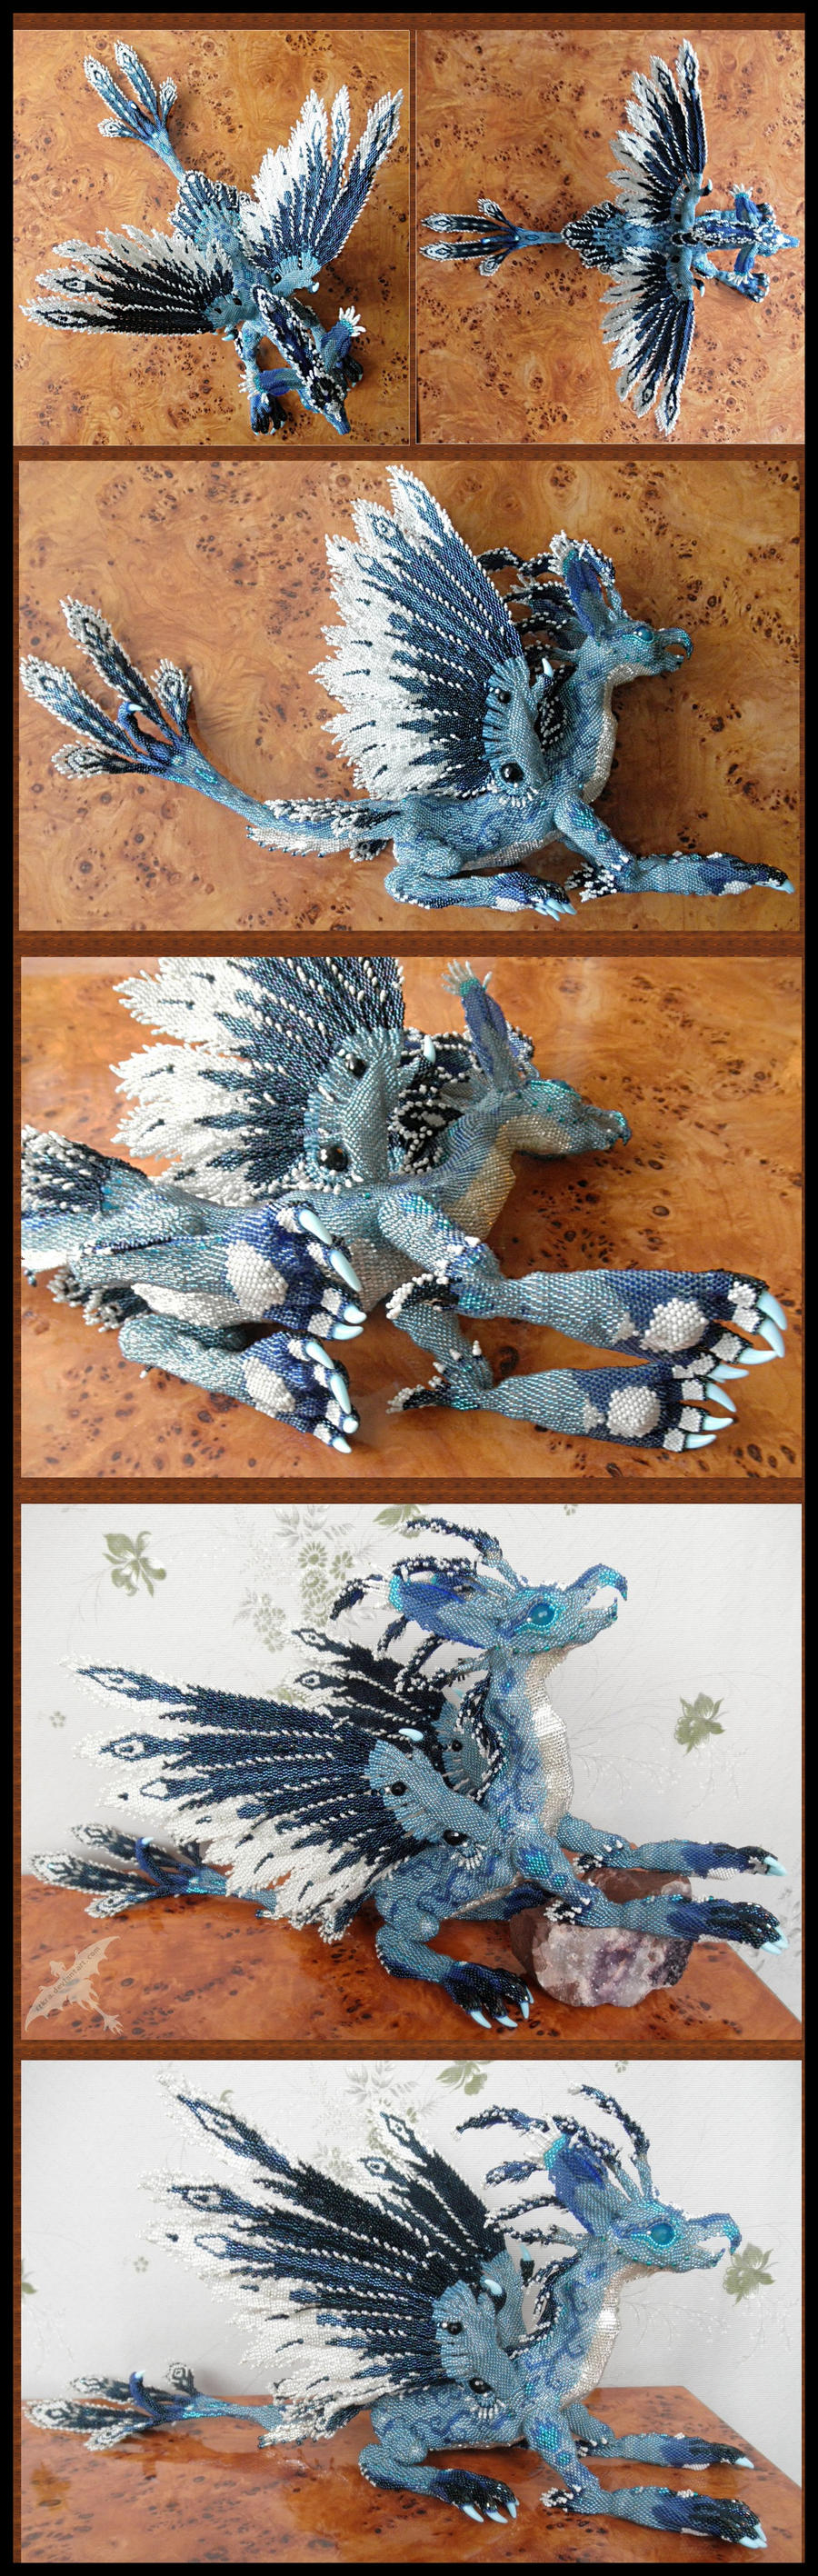 Hi, I have feathers by Rrkra